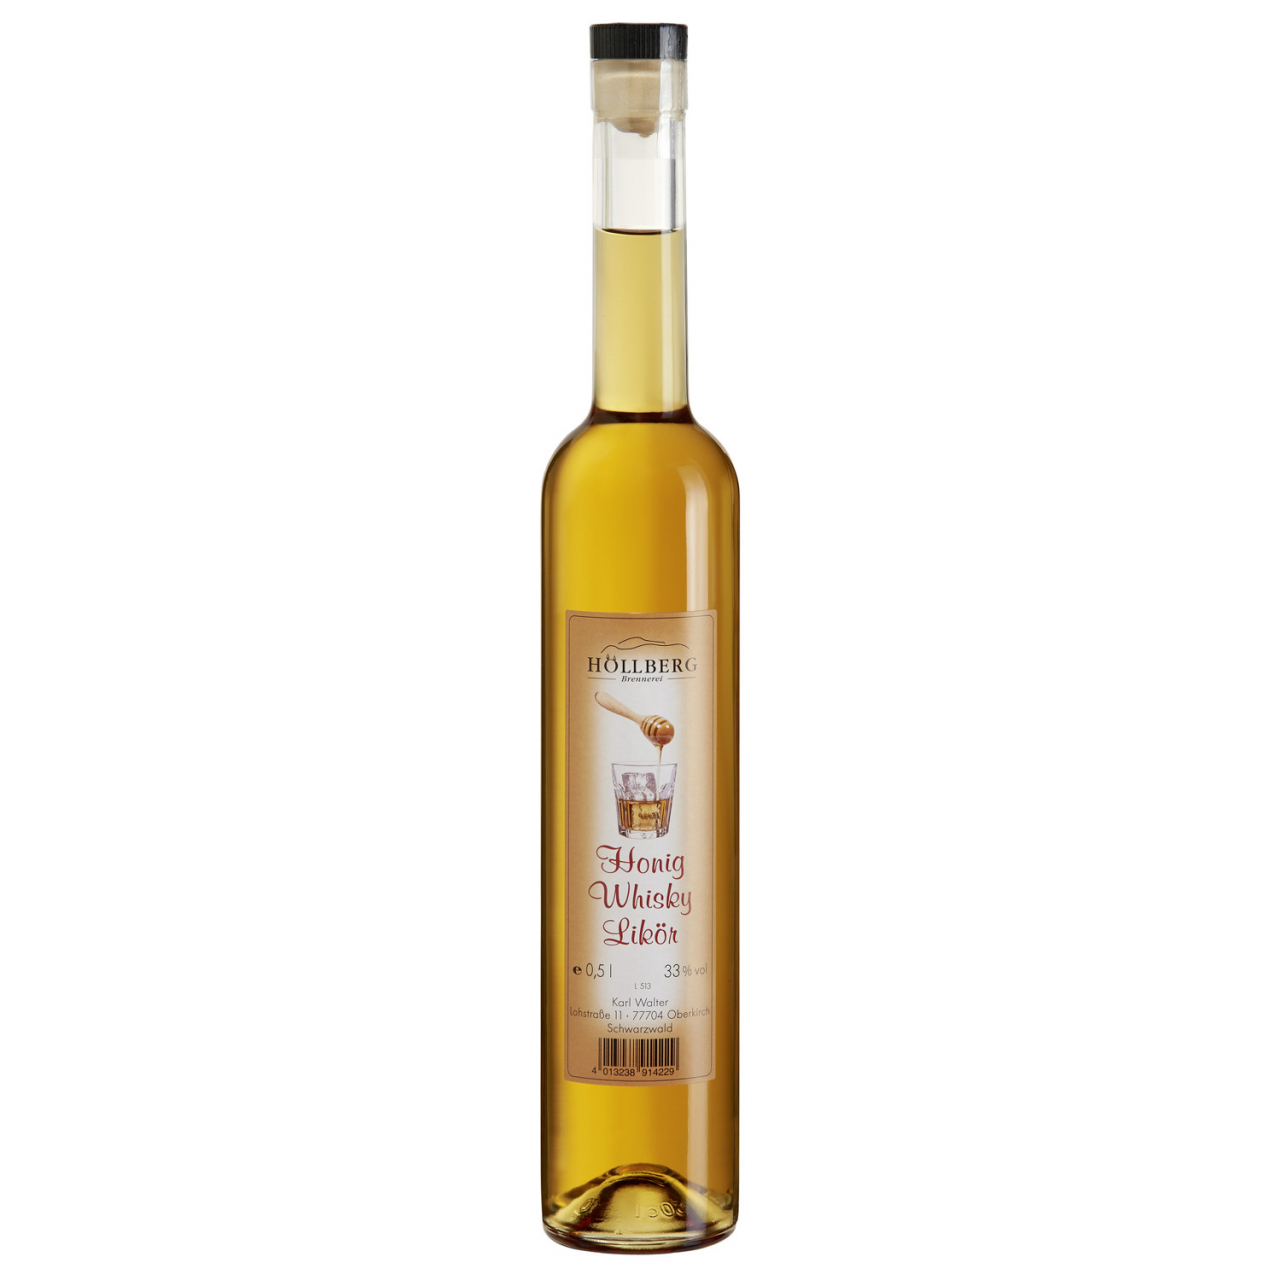 0,5 Liter Flasche Höllberg Honig-Whisky.Likör